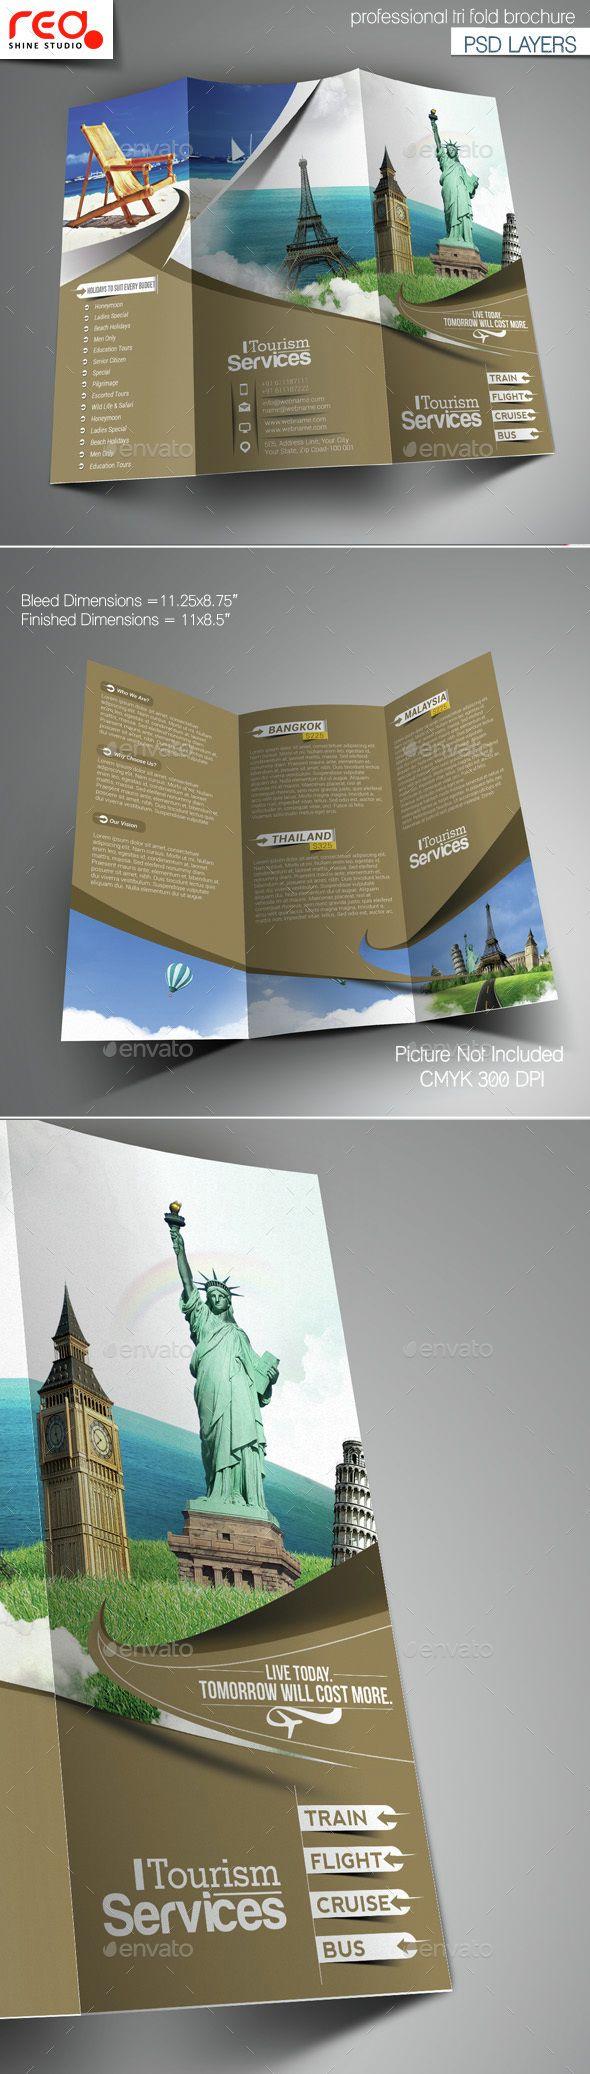 Tourism Service Trifold Brochure Template  Brochure Template